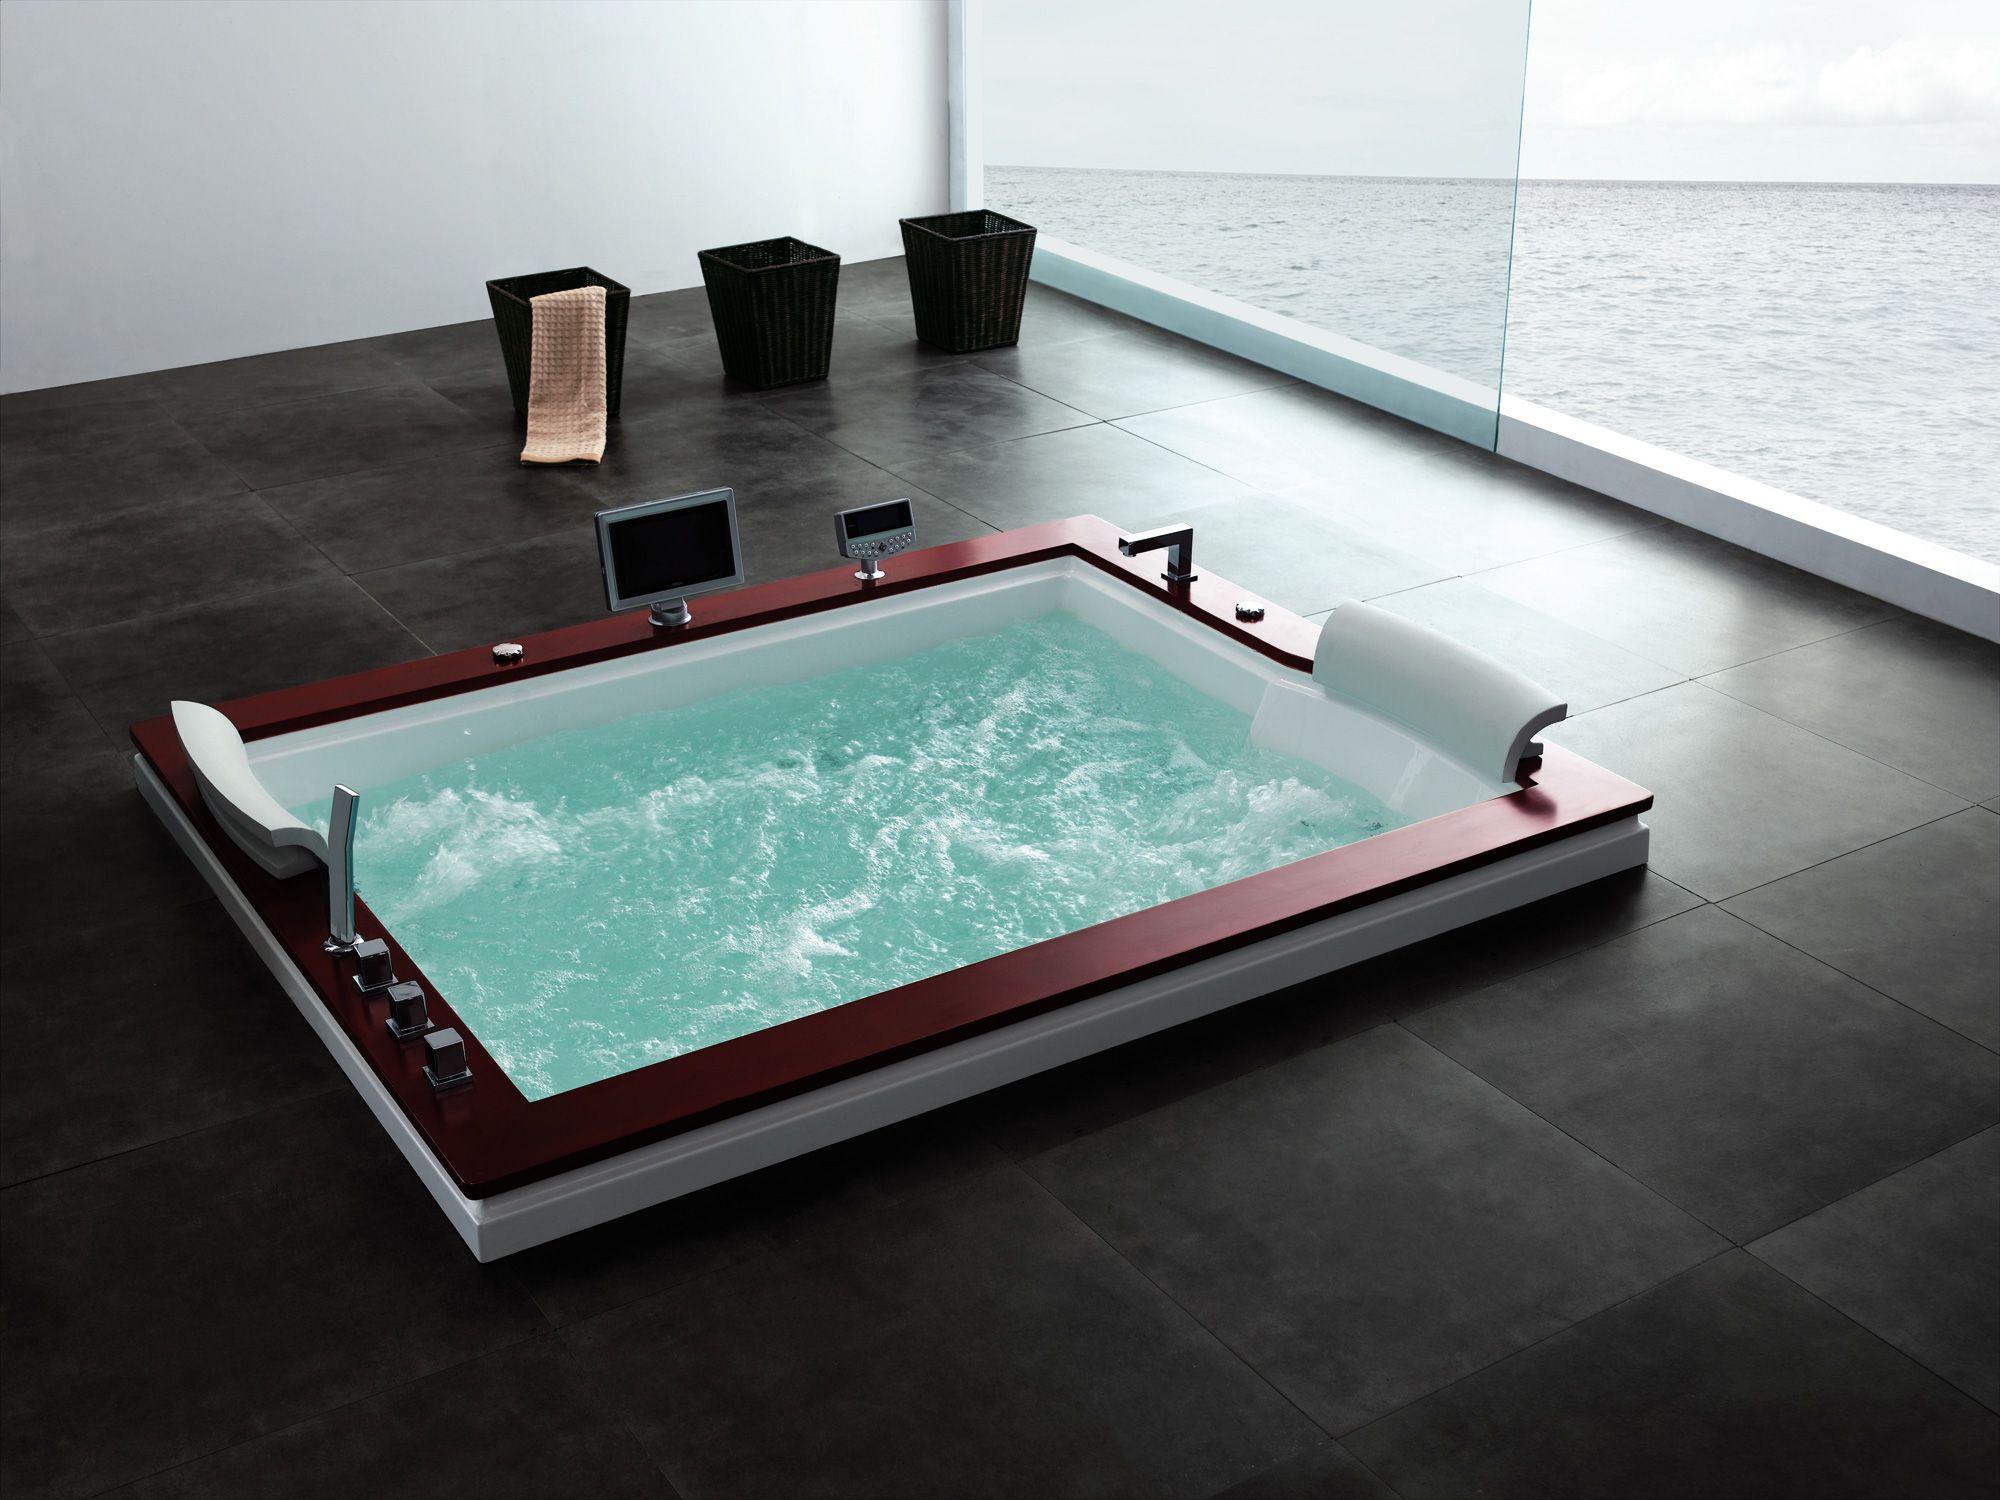 SSWW A510 Massage Bathtub   Bathtub   Pinterest   Bathtubs